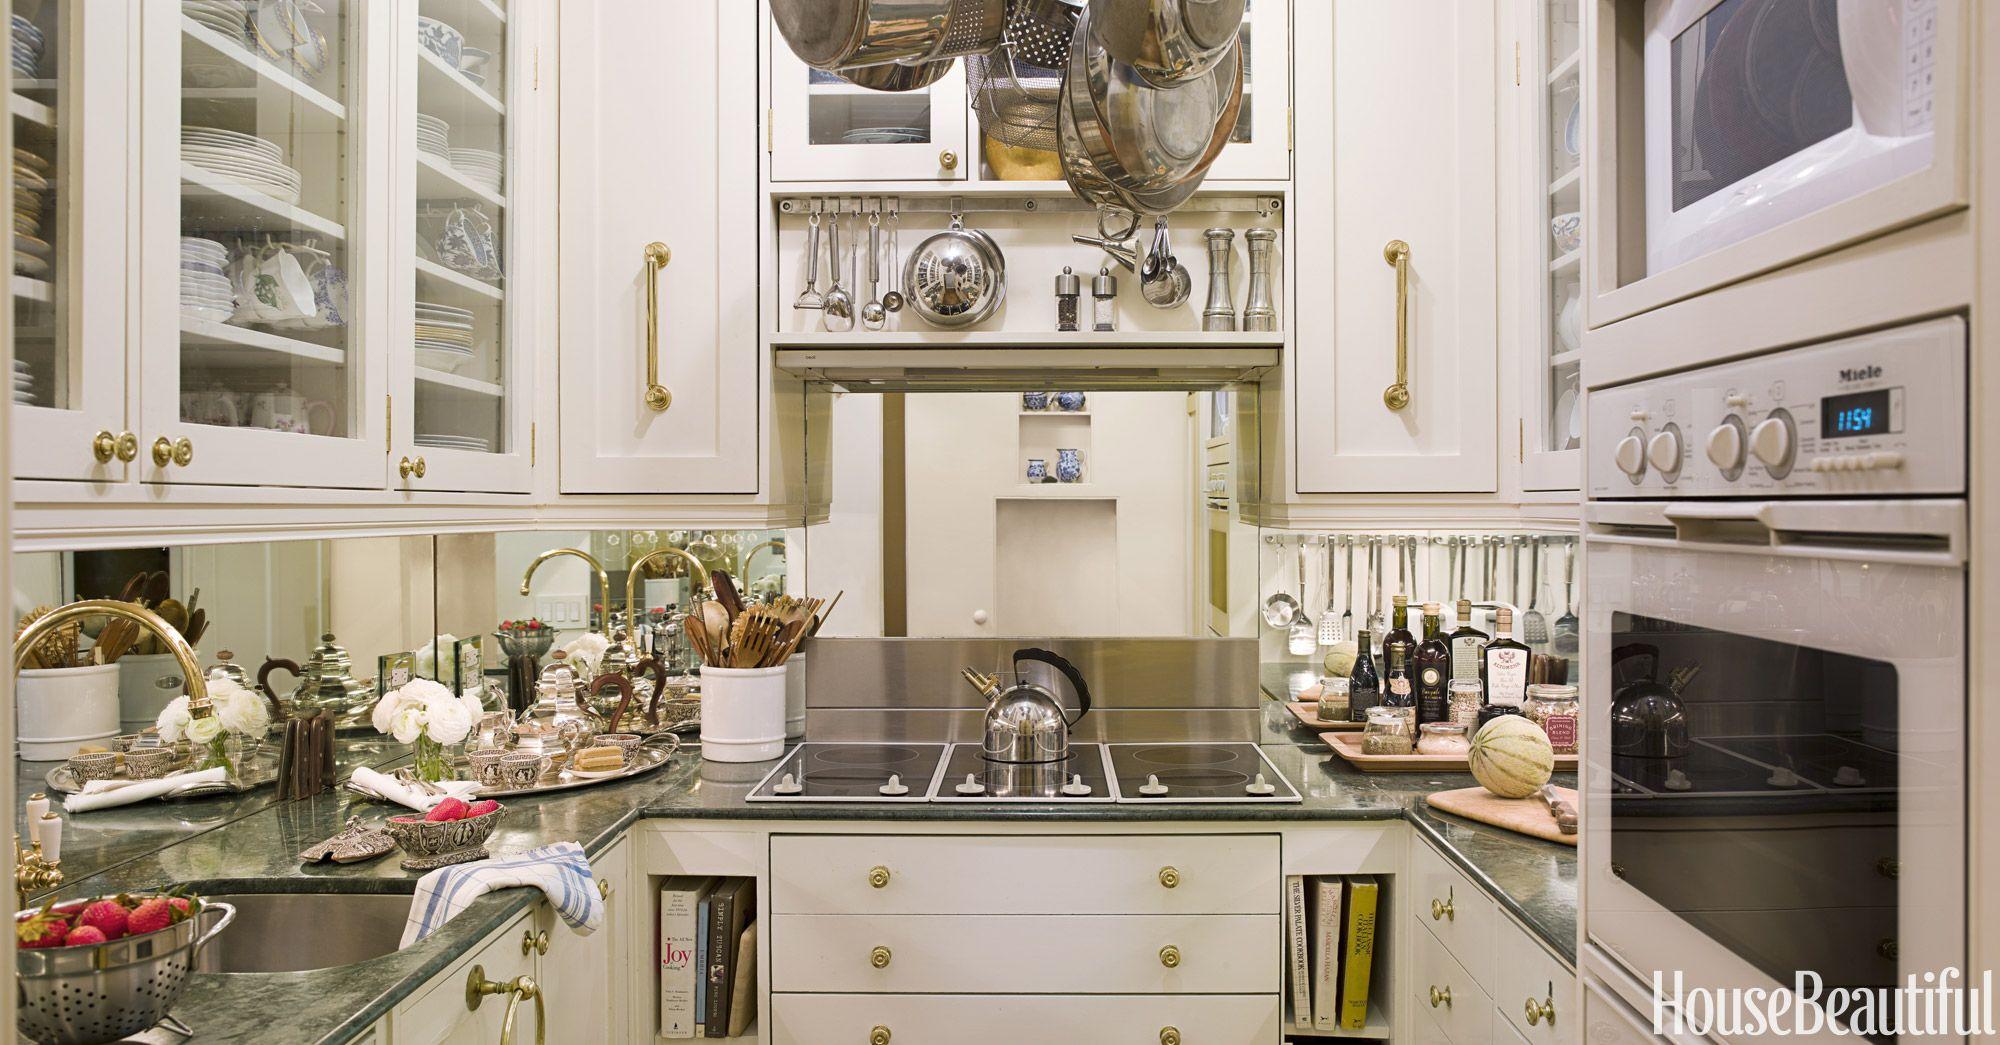 50 Small Kitchen Ideas That Won't Make You Feel